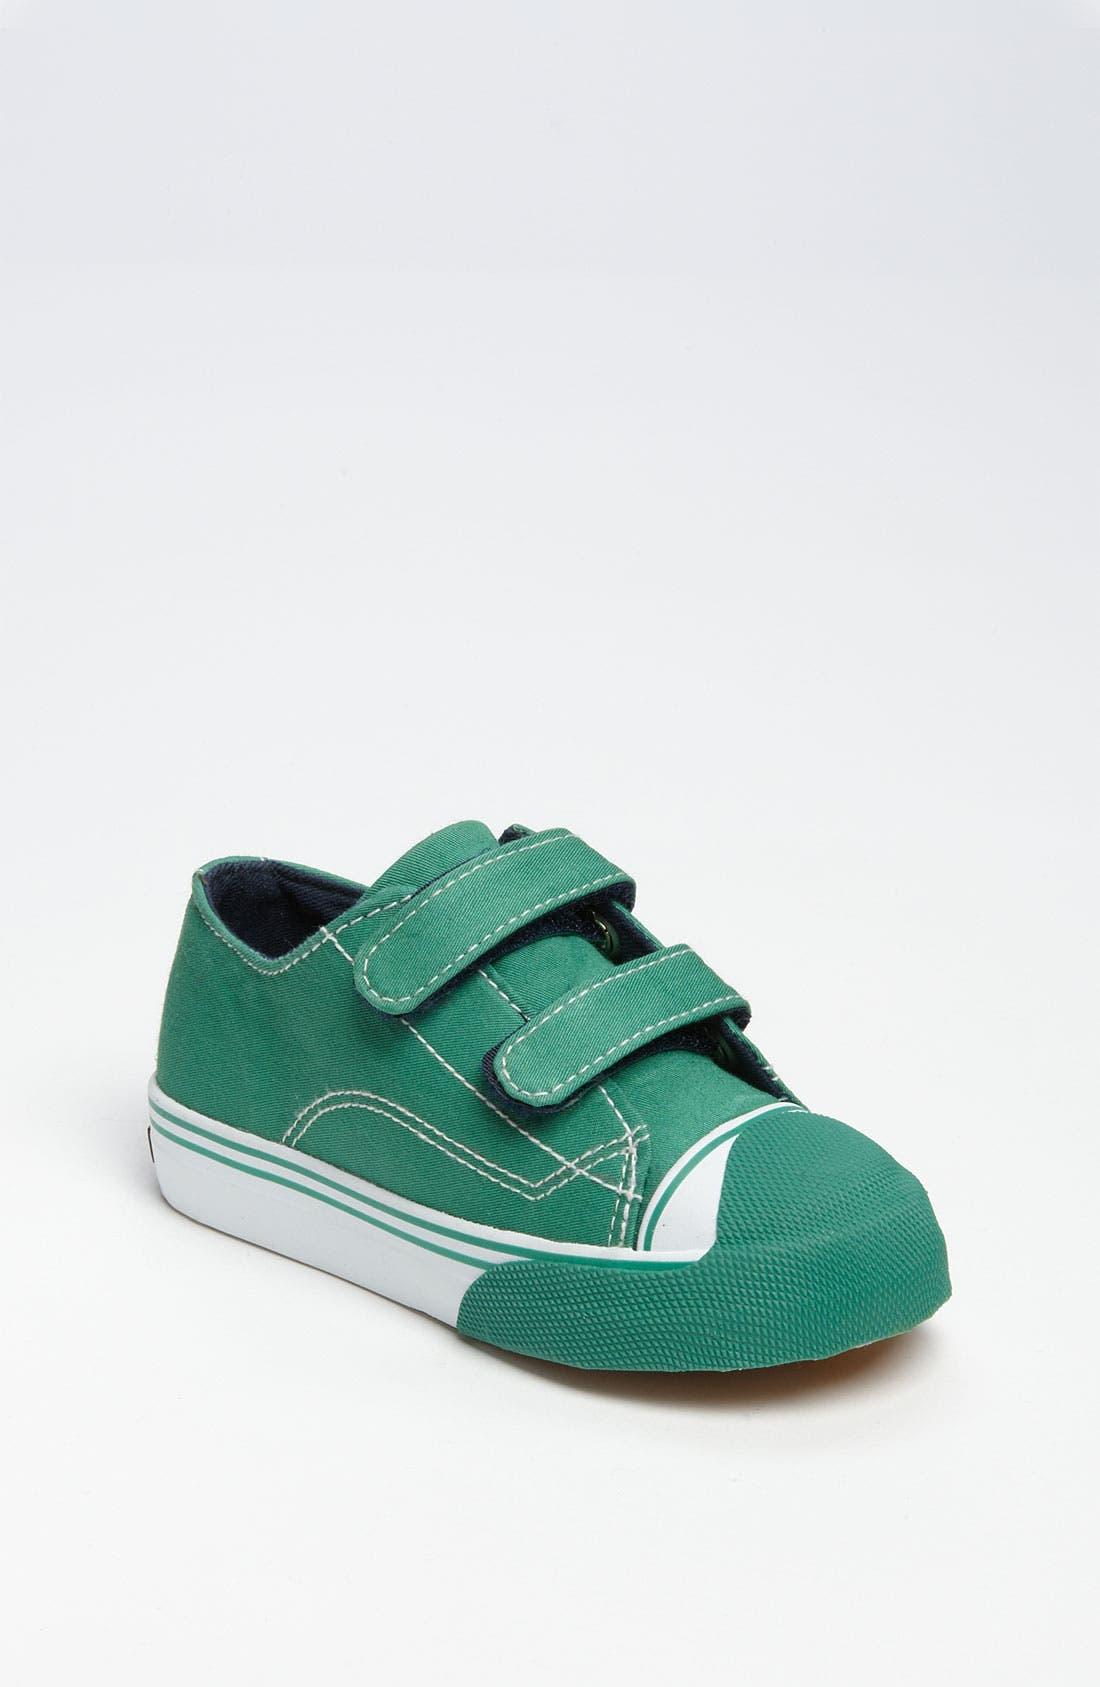 Main Image - Morgan & Milo 'Avery II' Sneaker (Walker & Toddler)